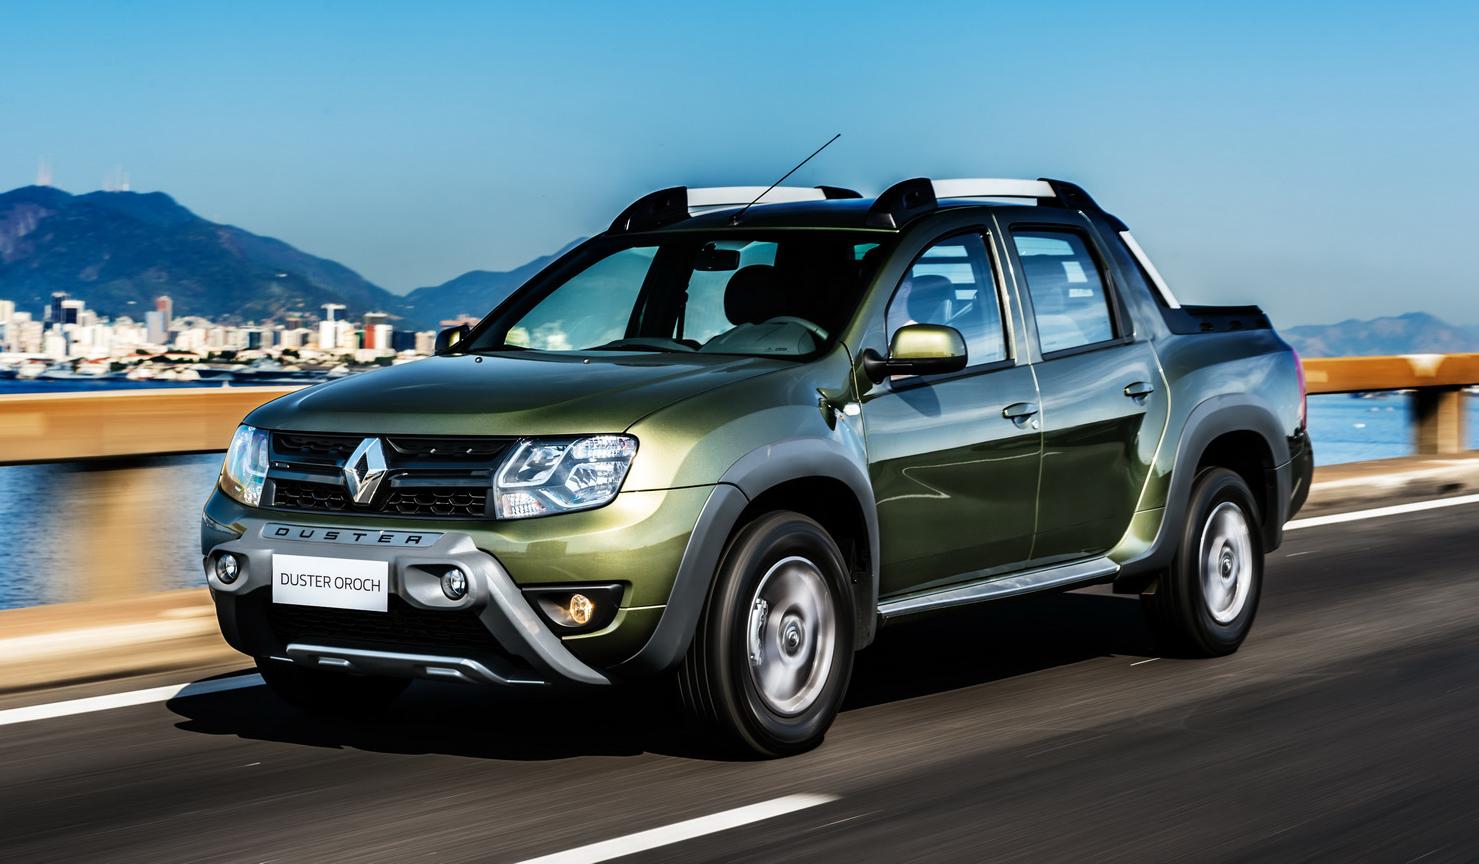 Renault Lance Le Duster Oroch Blog Kidioui Fr